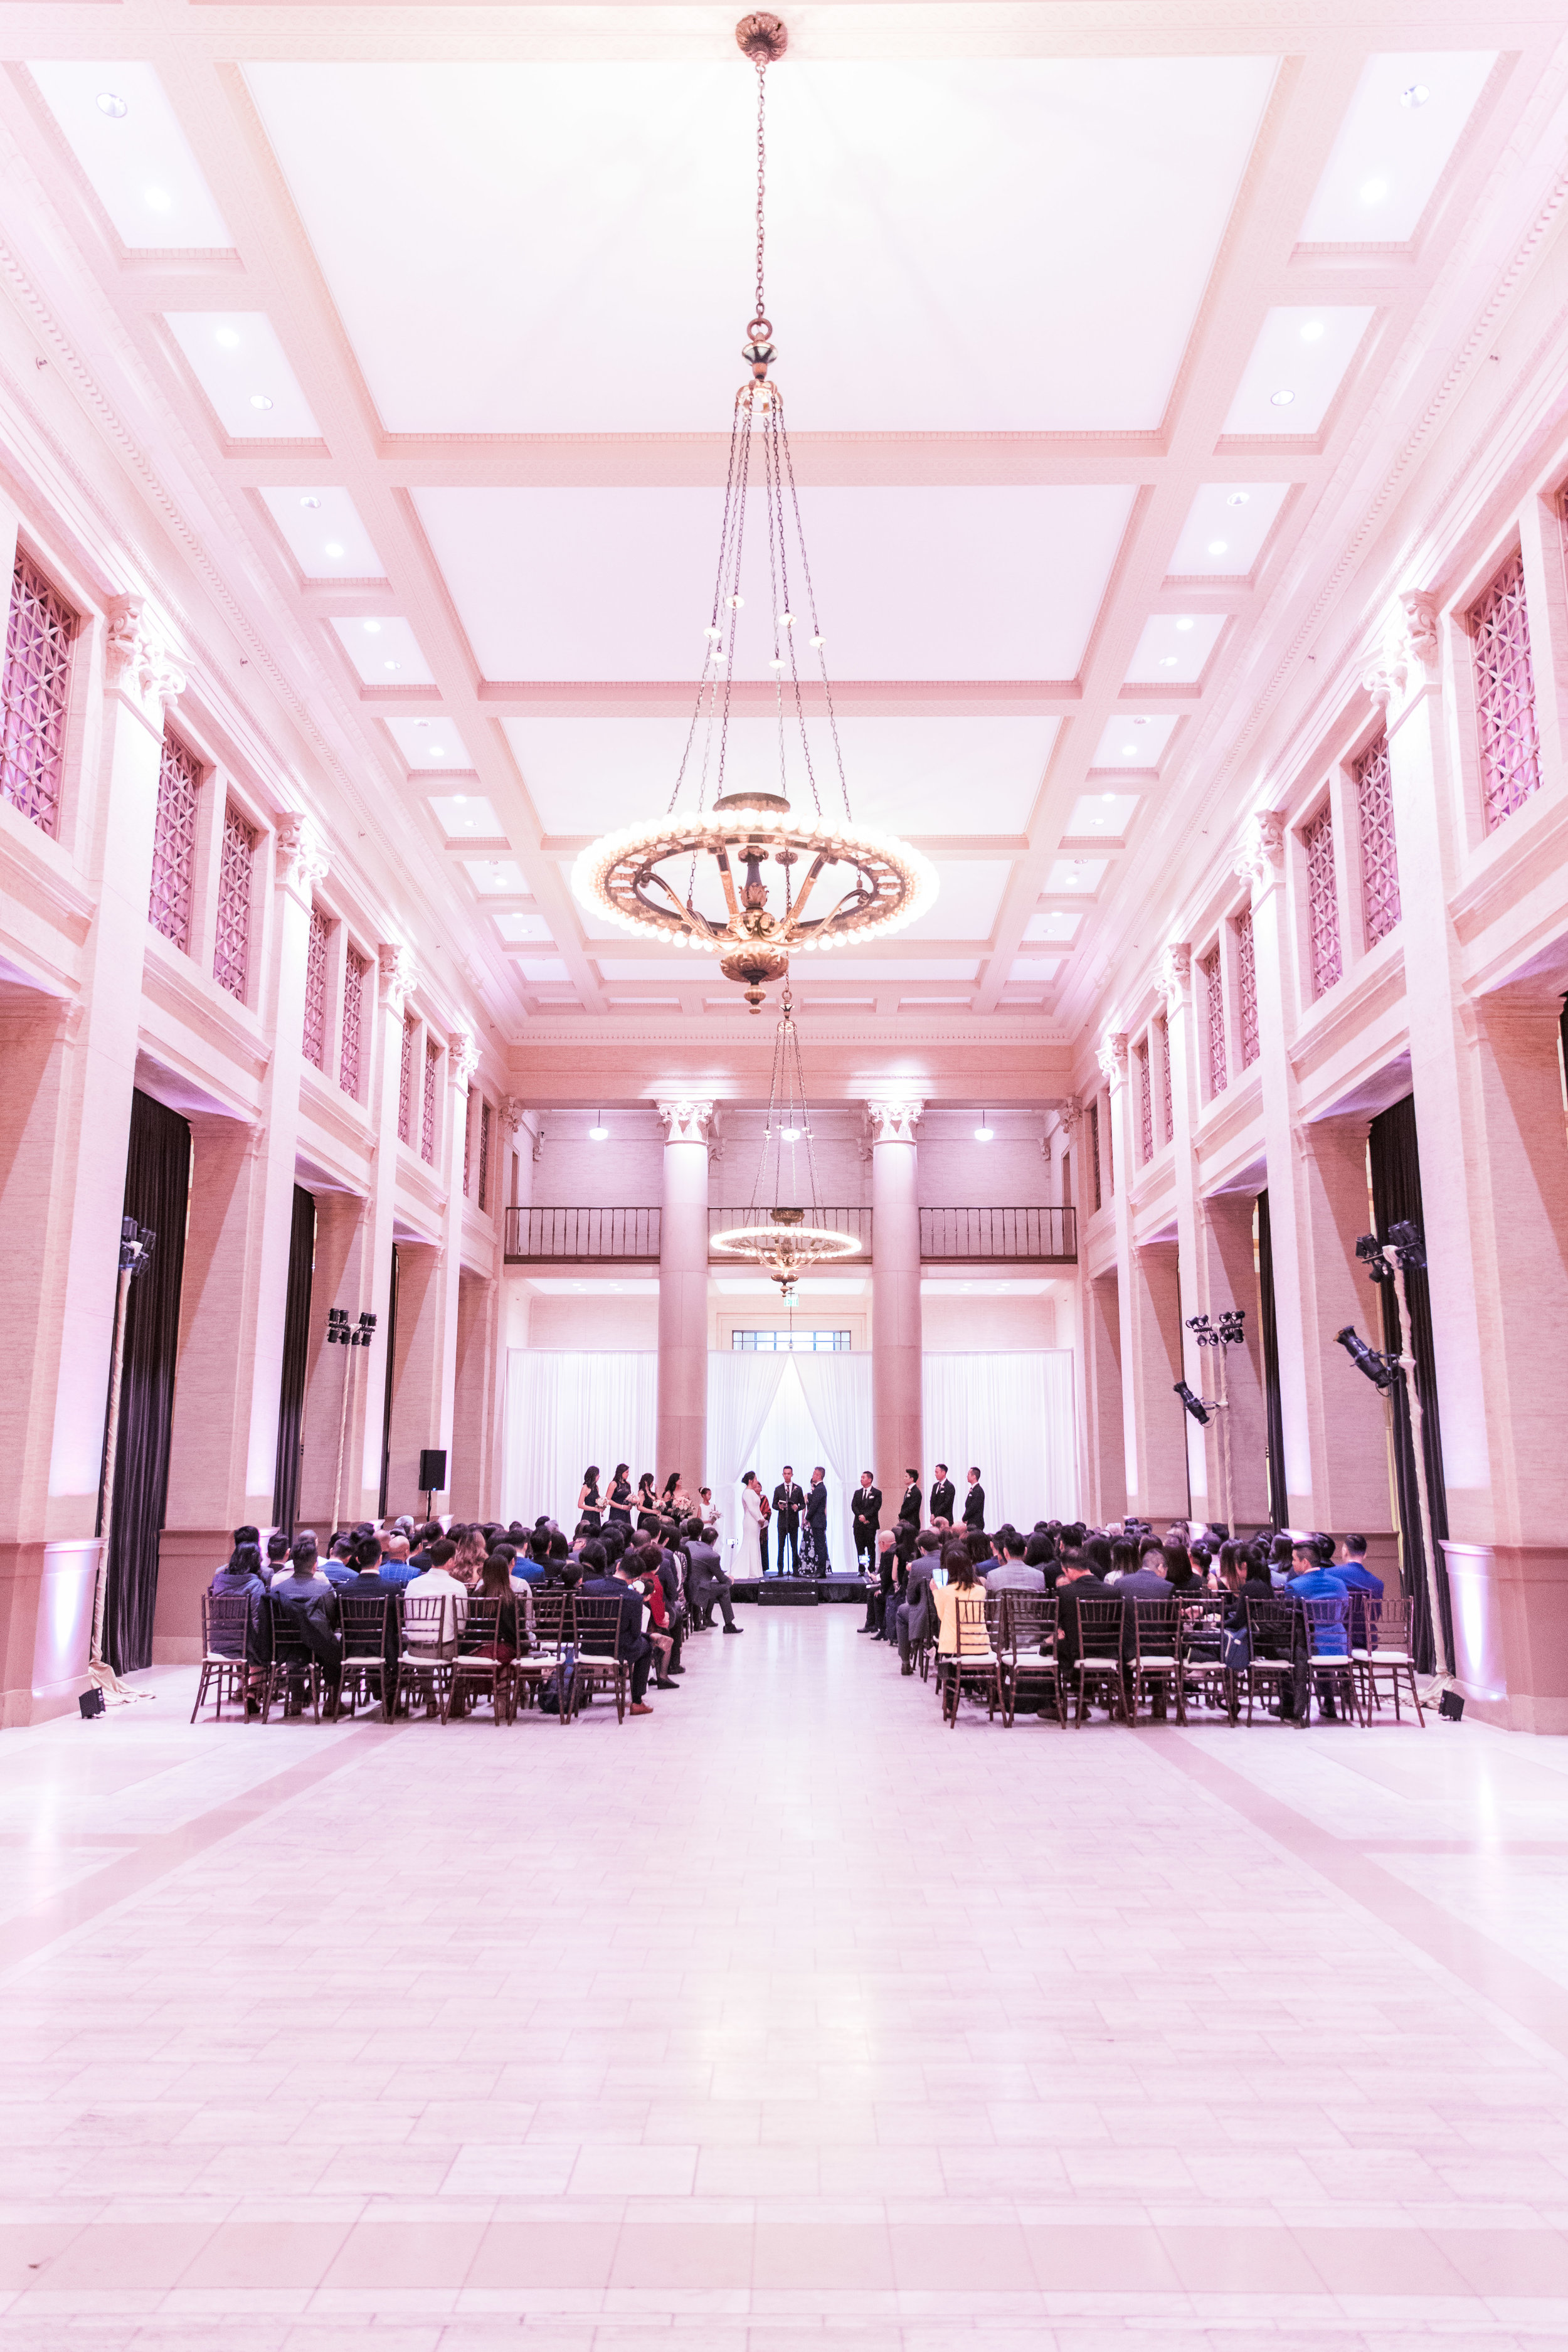 Marina-Eugene-Wedding-by-JBJ-Pictures-207.jpg